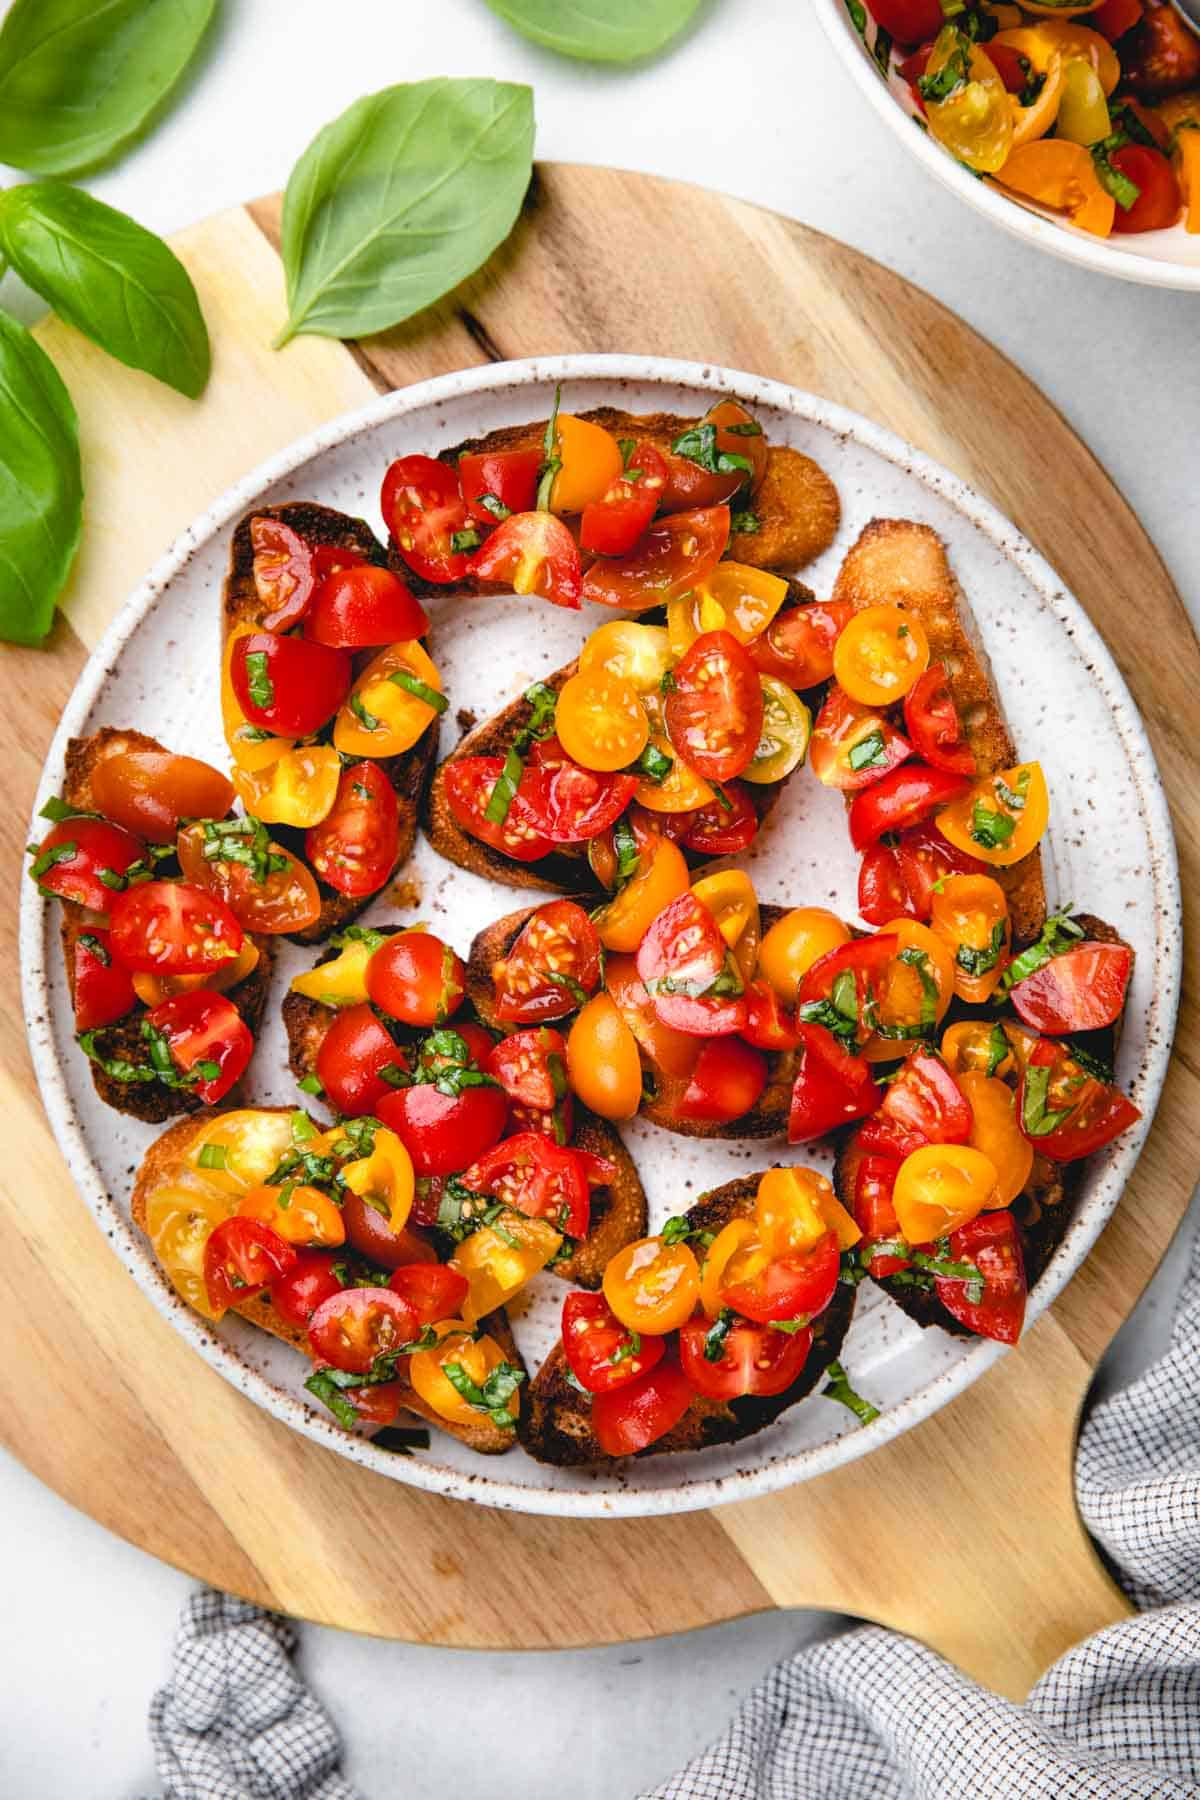 Cherry tomato bruschetta on a white plate.